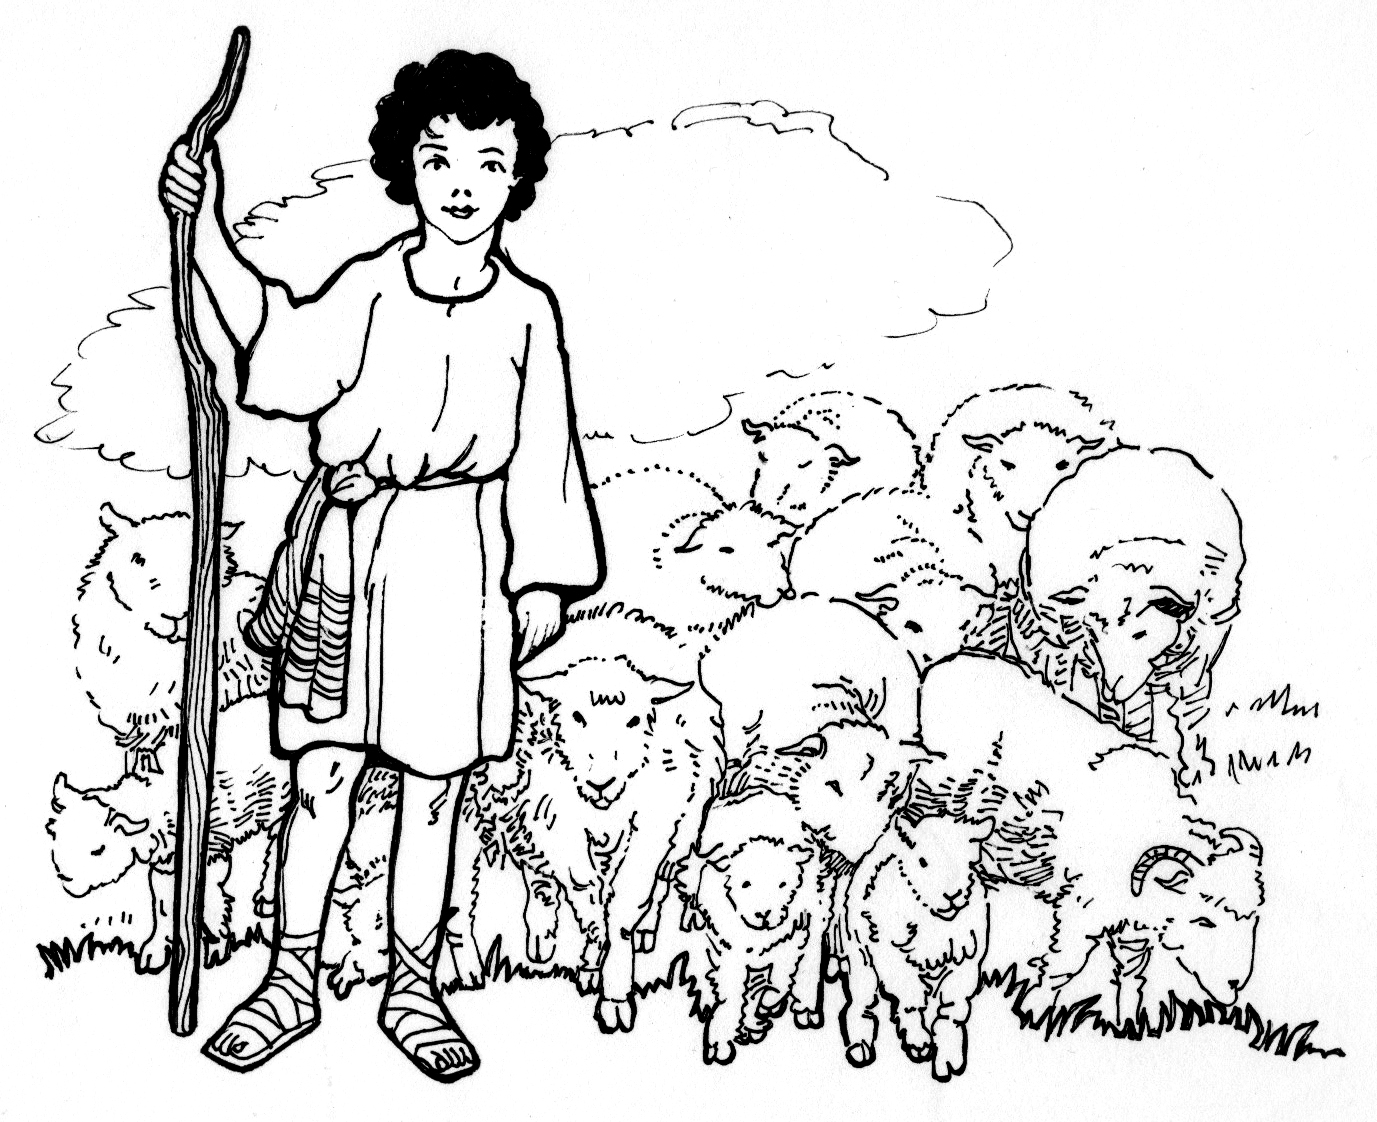 David The Shepherd Boy Coloring Pages David The Shepherd Boy Coloring Page